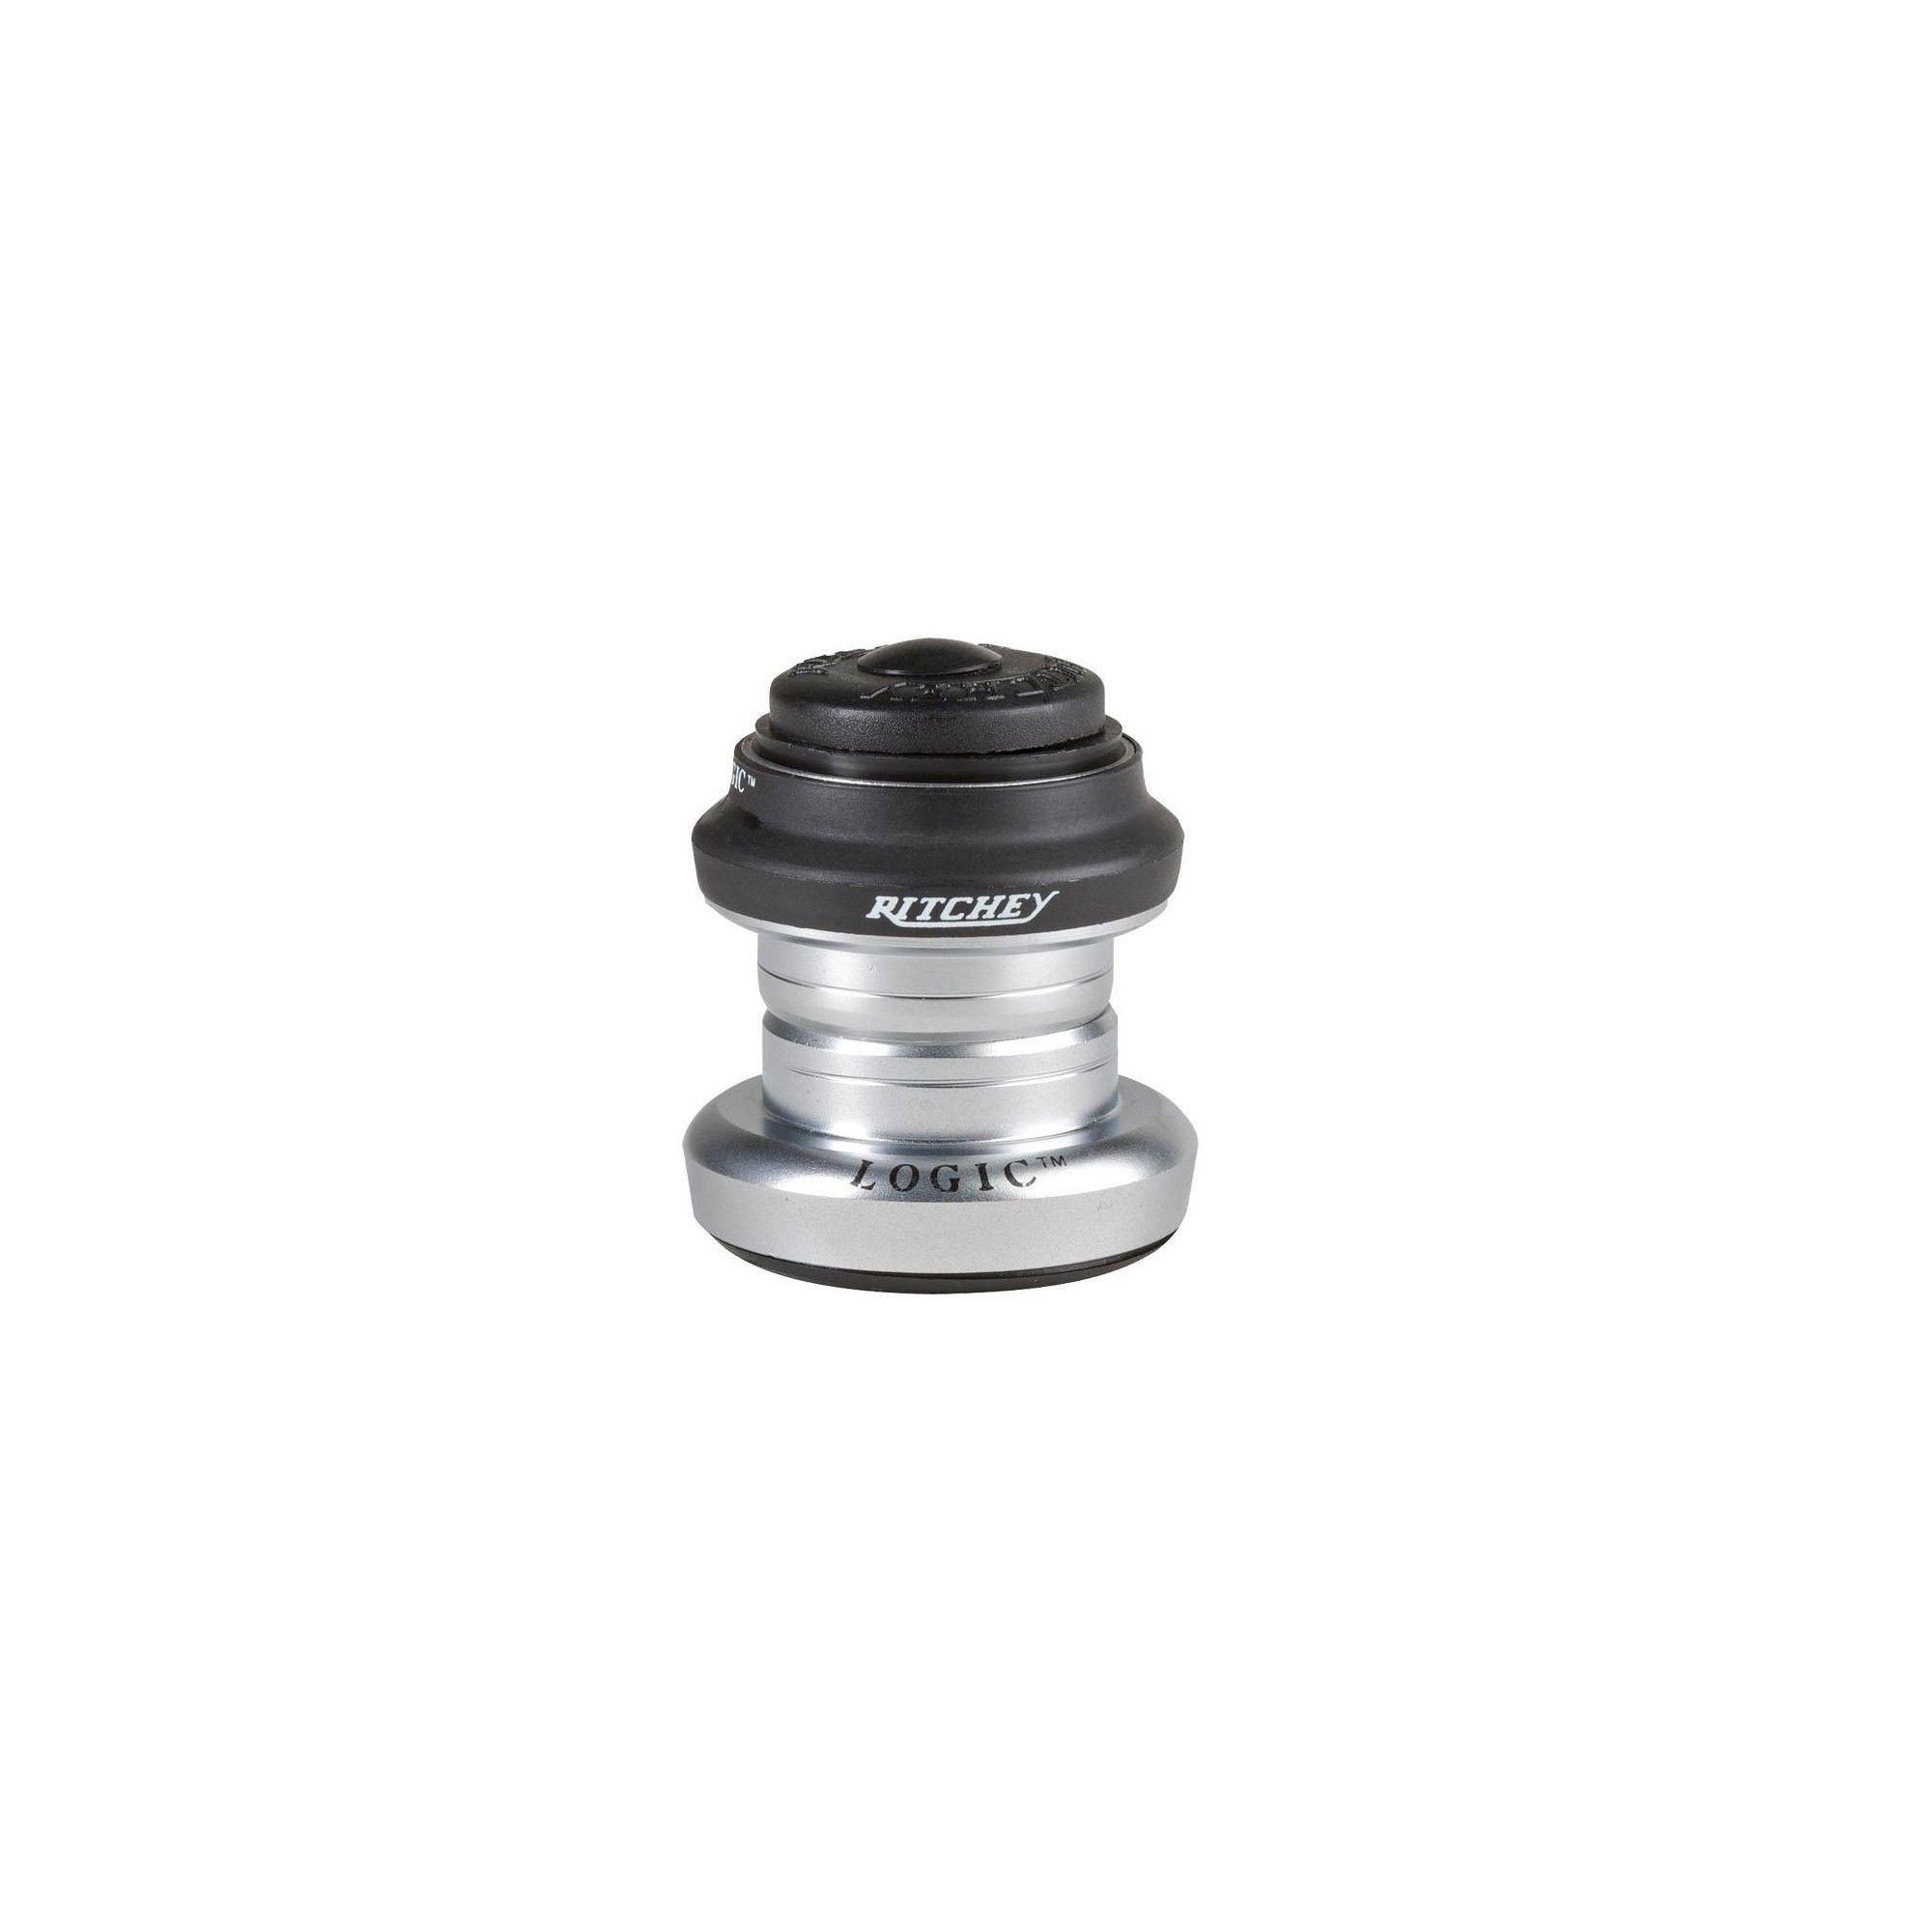 Ritchey Logic 1 Threadless Headset EC30//25.4 EC30//26 Black//Silver